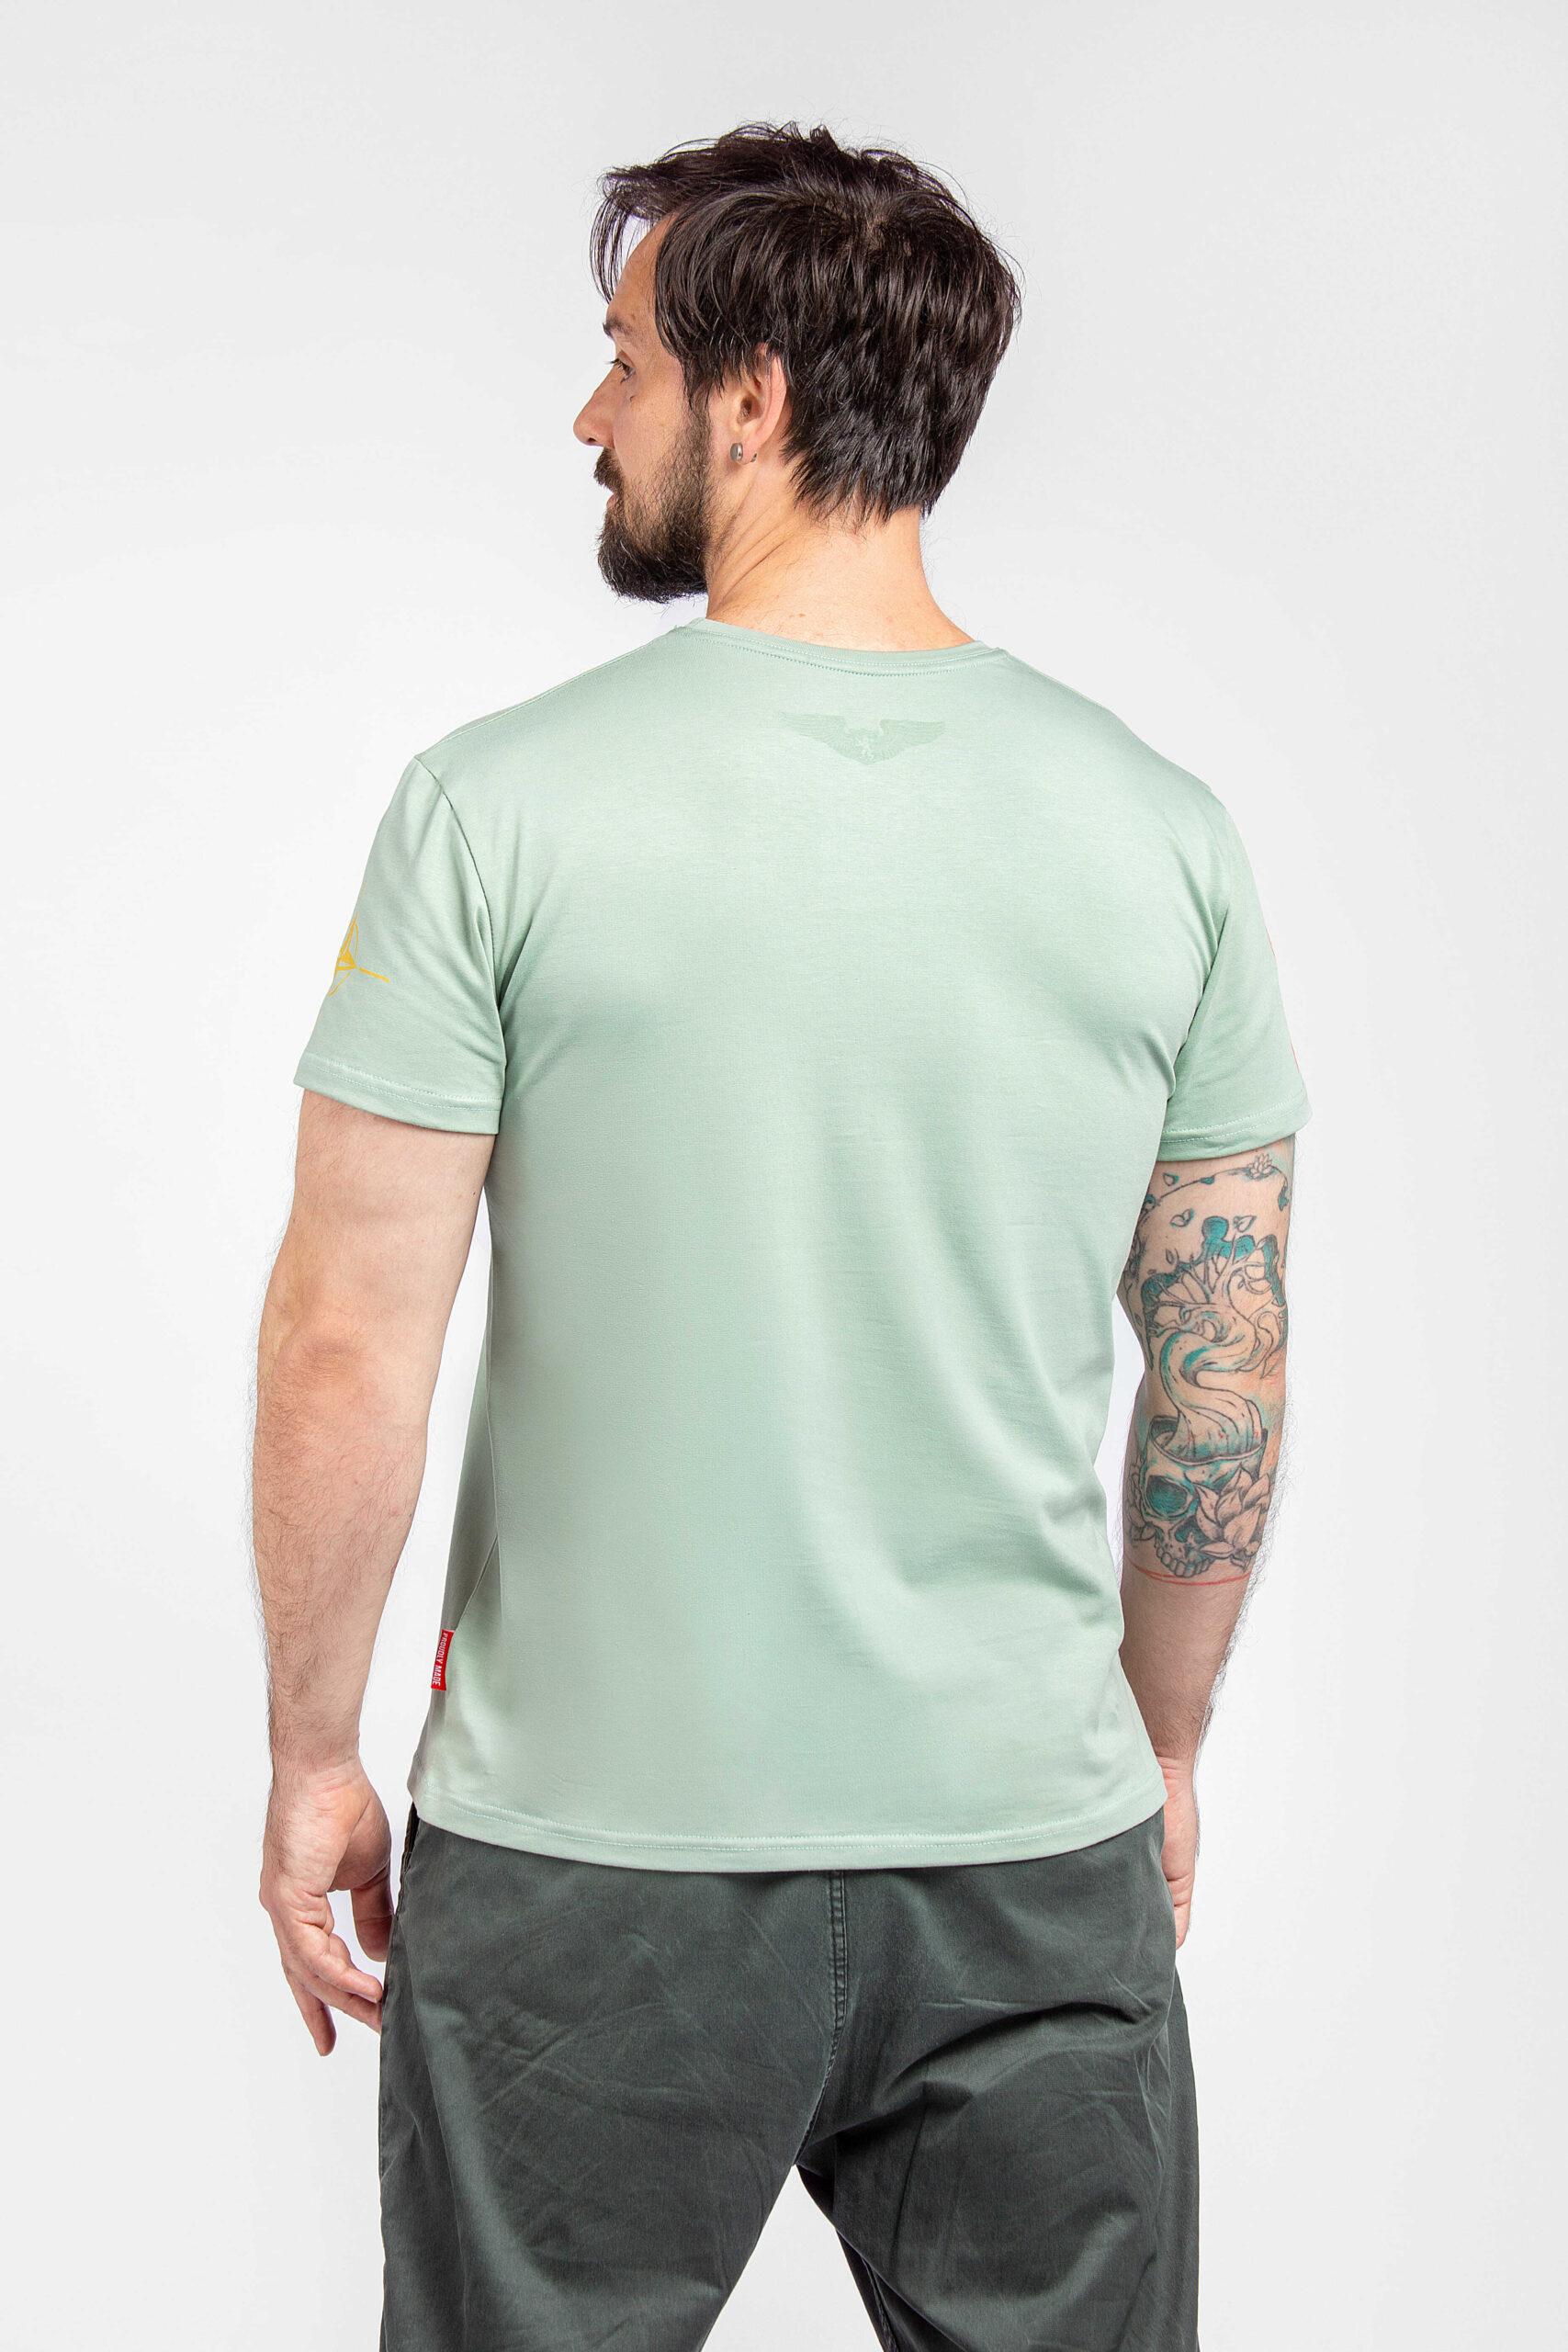 Men's T-Shirt Defenders Of The Sea. Color mint.  Material: 95% cotton, 5% spandex.